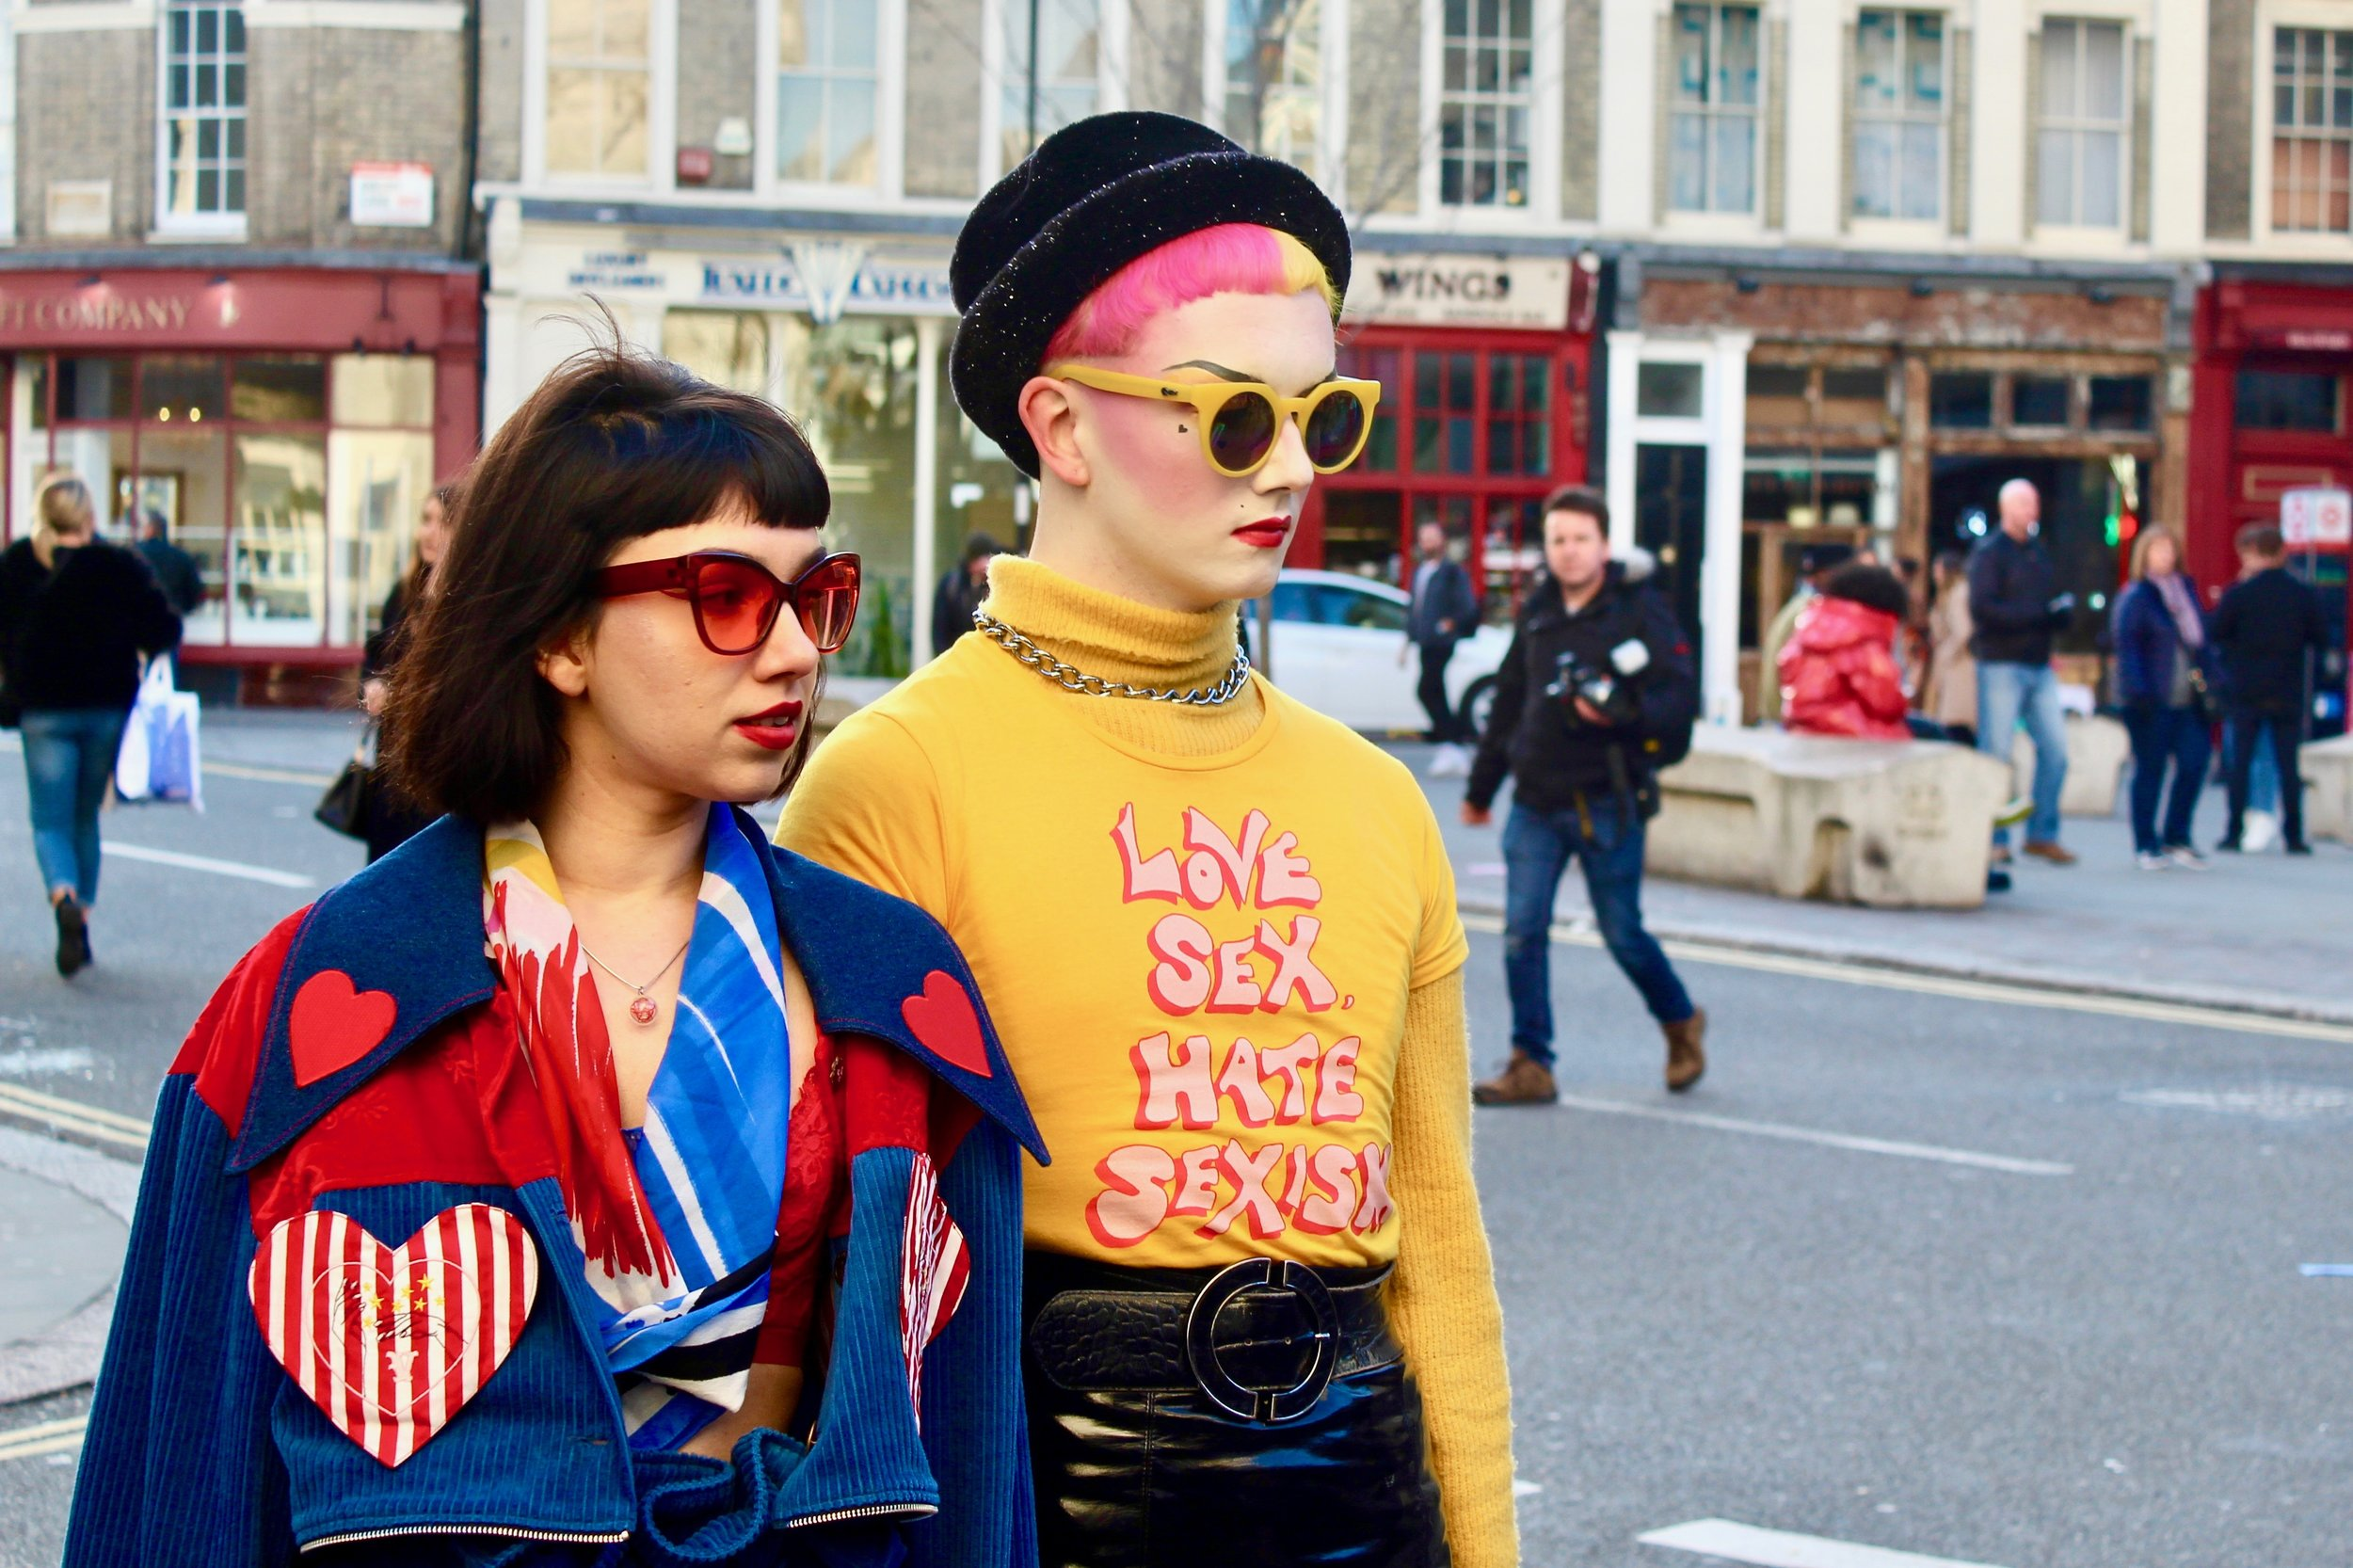 Feminist Fashionistas posing outside the venue